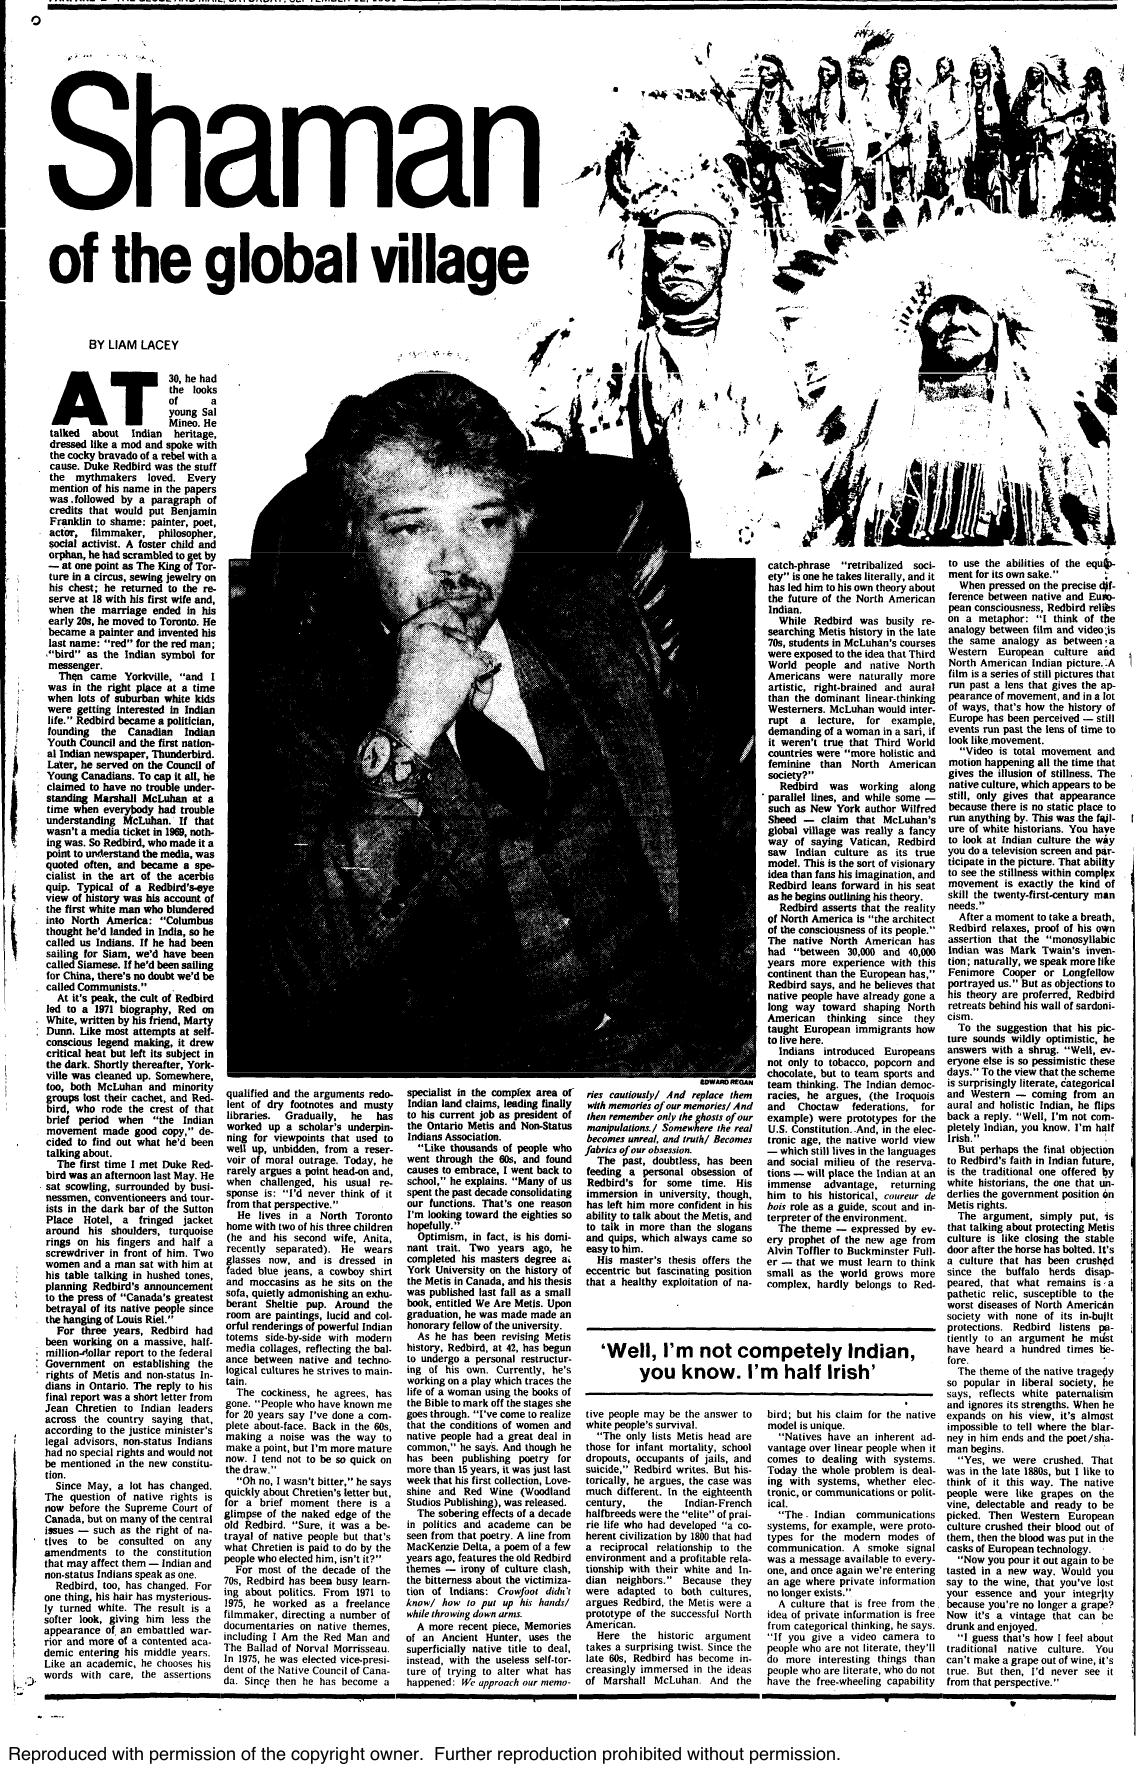 Shaman_of_the_global_villageSep 12 1981.jpg